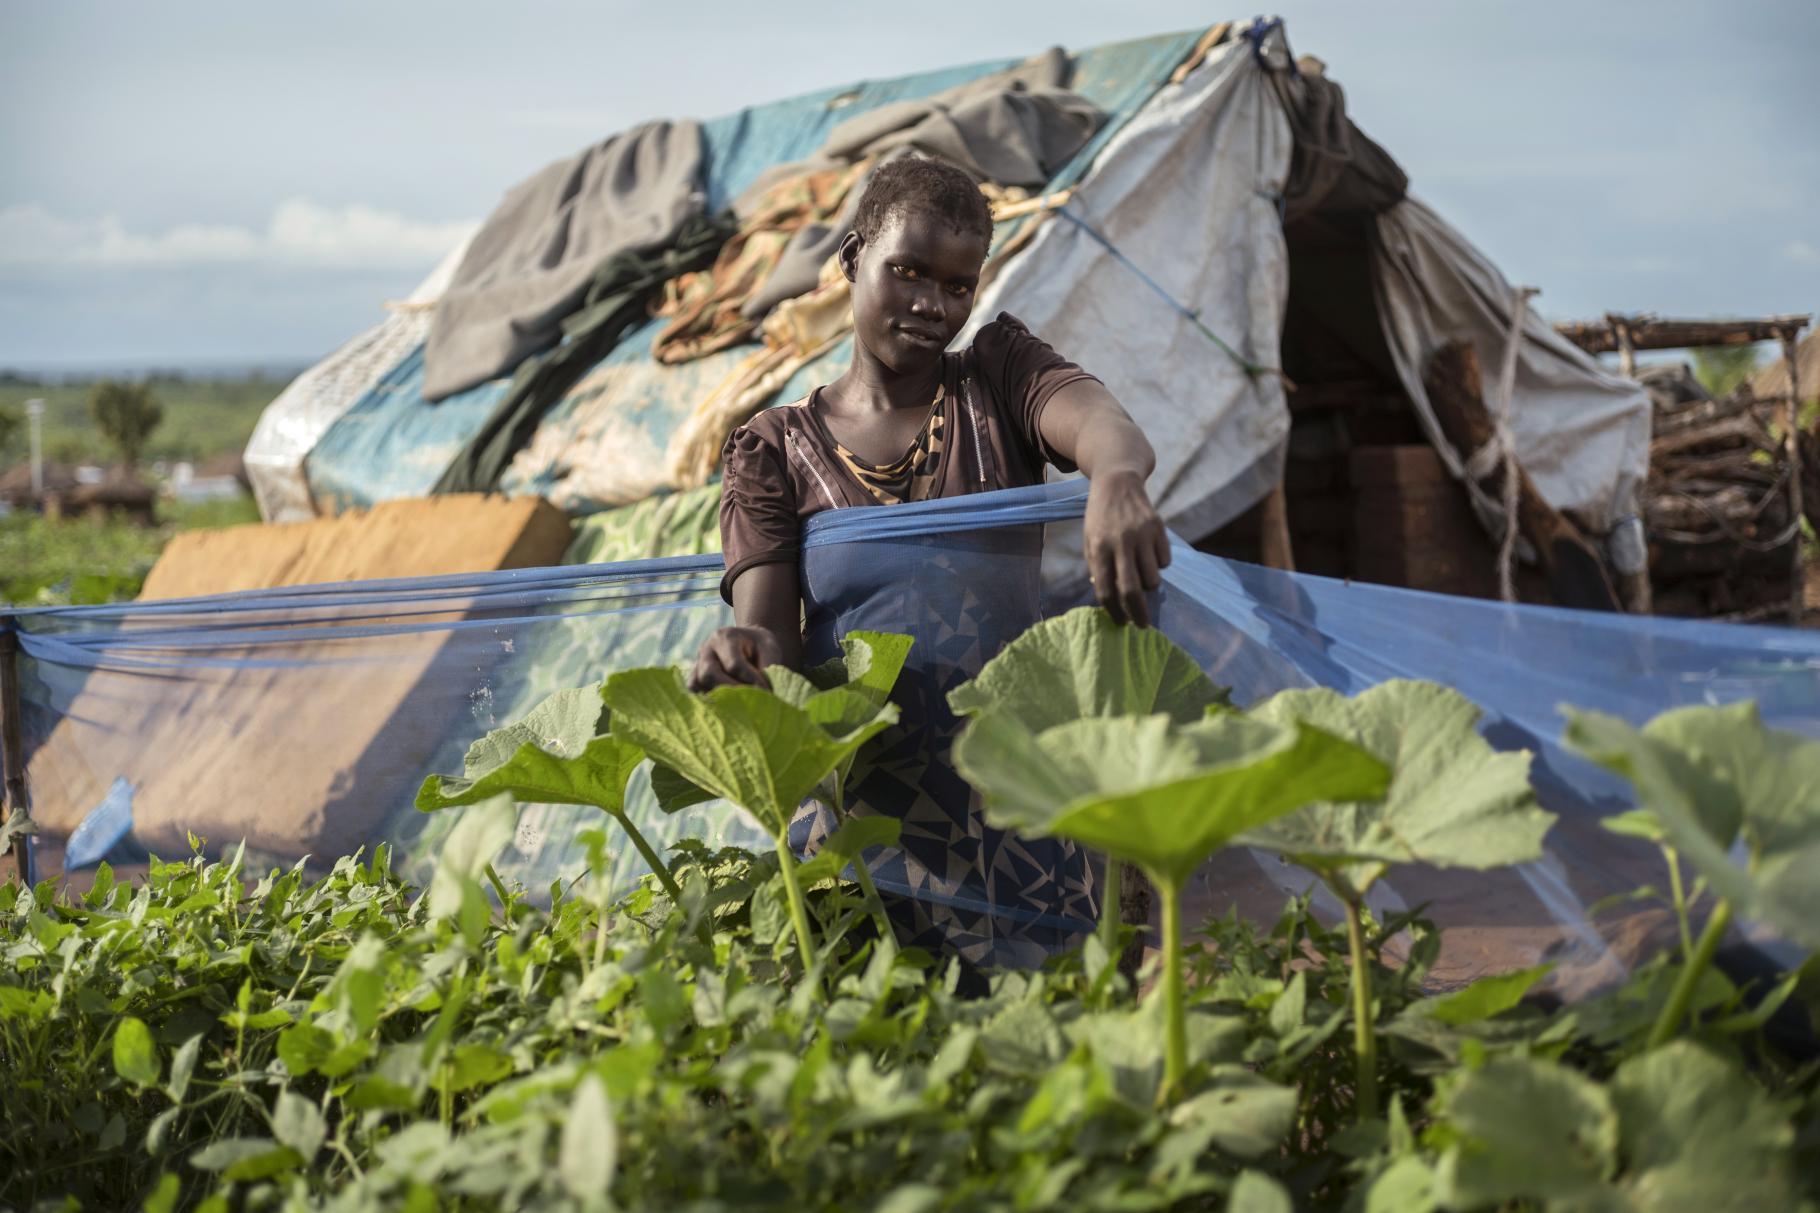 Charity aus Südsudan in einer Flüchtlingssiedlung in Uganda